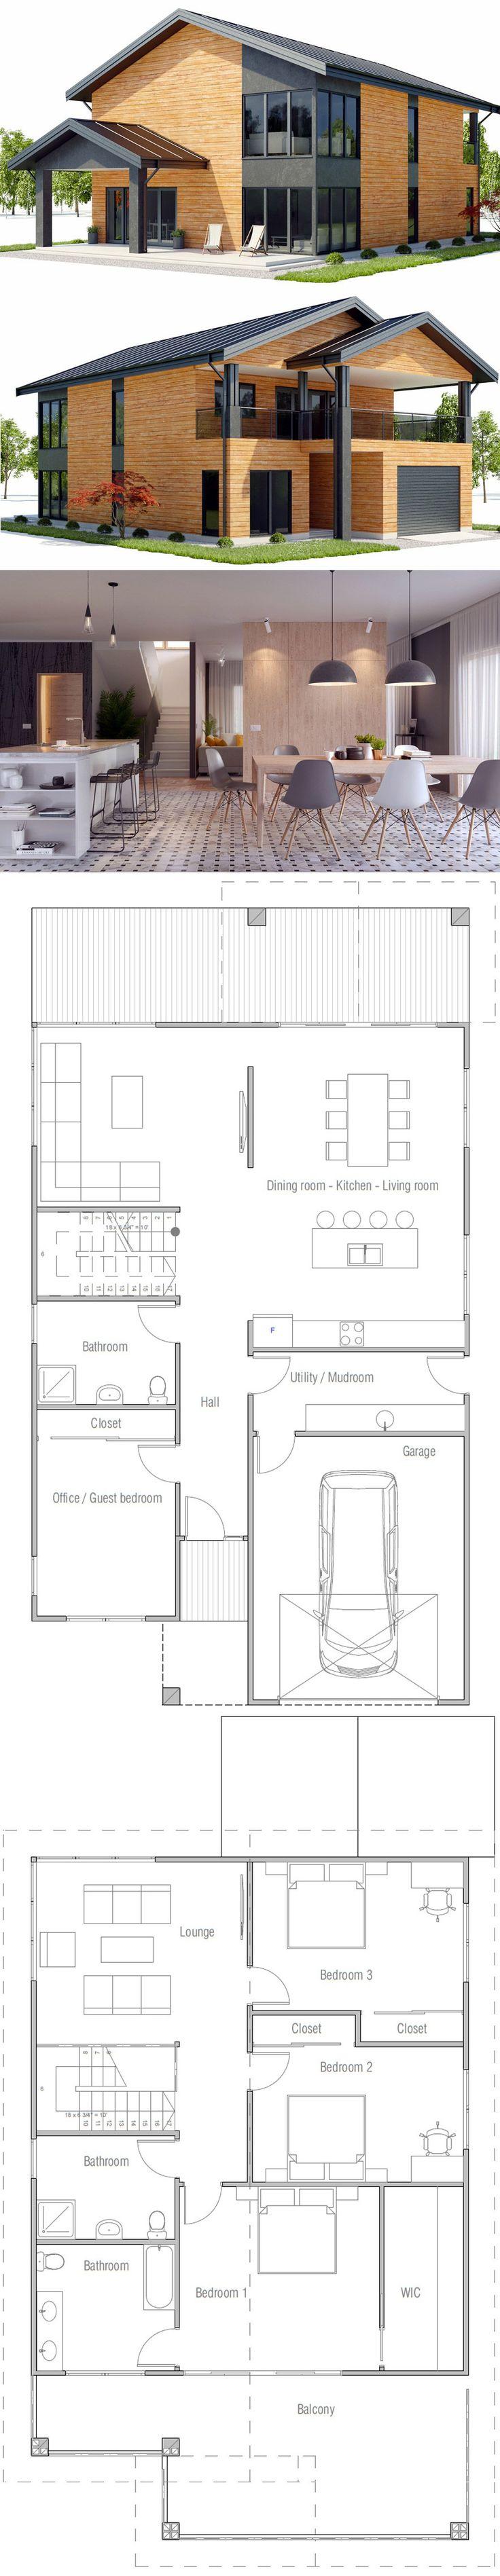 House Plan 467